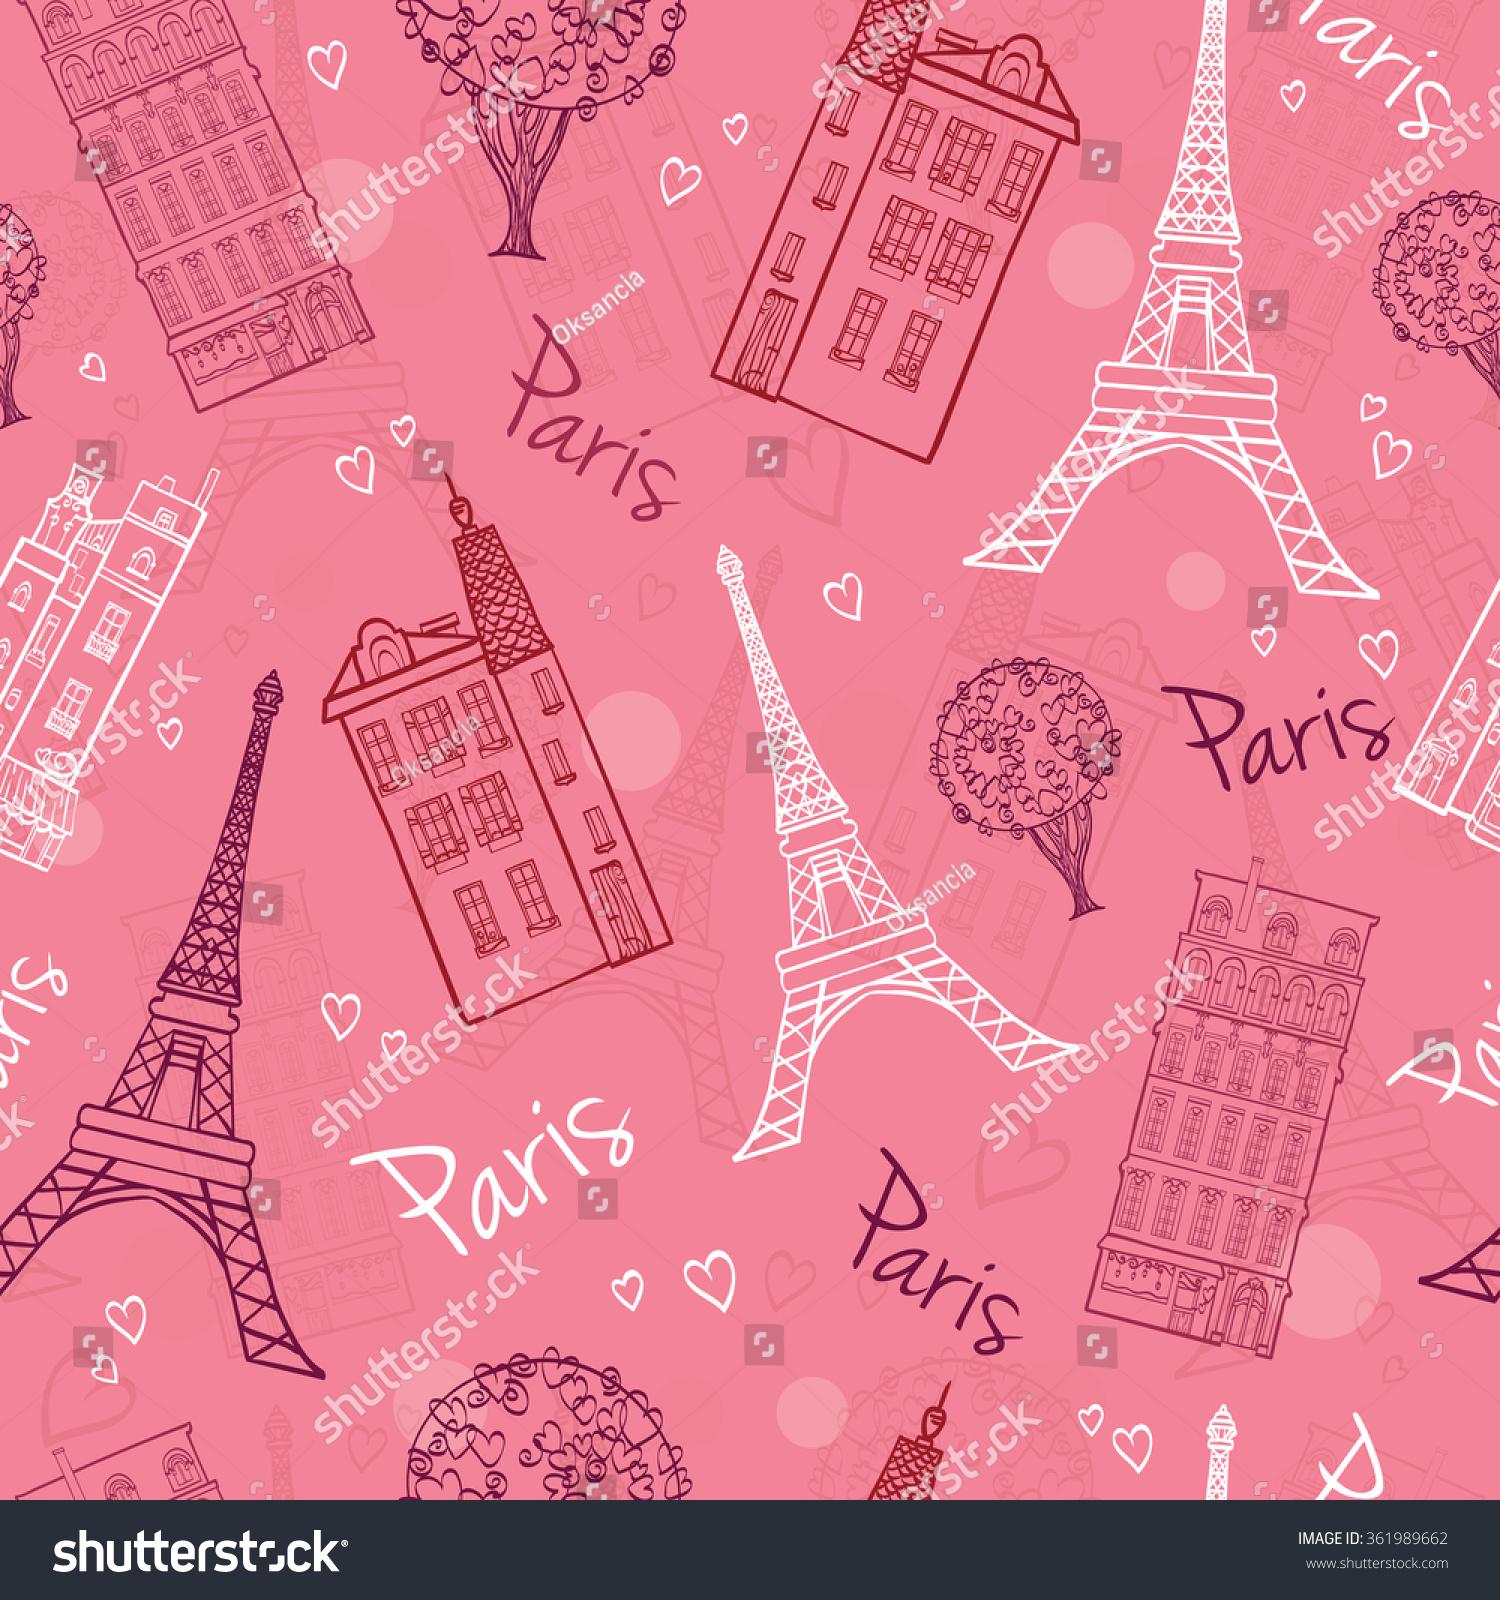 As Creation Pink Paris Pattern Eiffel Tower Childrens: Vector Pink Romantic Paris Streets Seamless Stock Vector